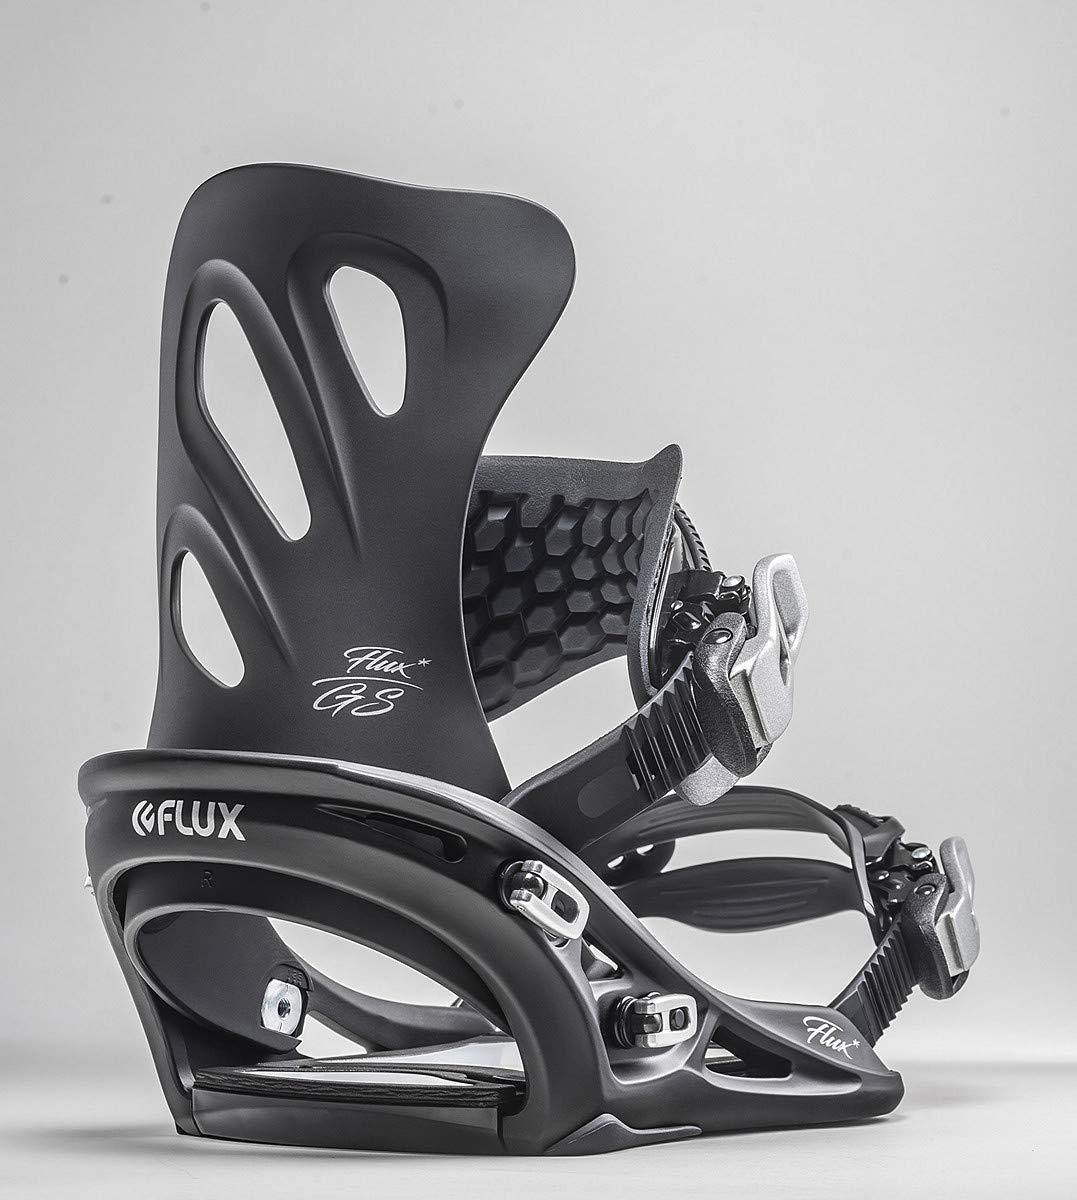 Womens 2020 FLUX GS Snowboard Binding Black, SmallMedium